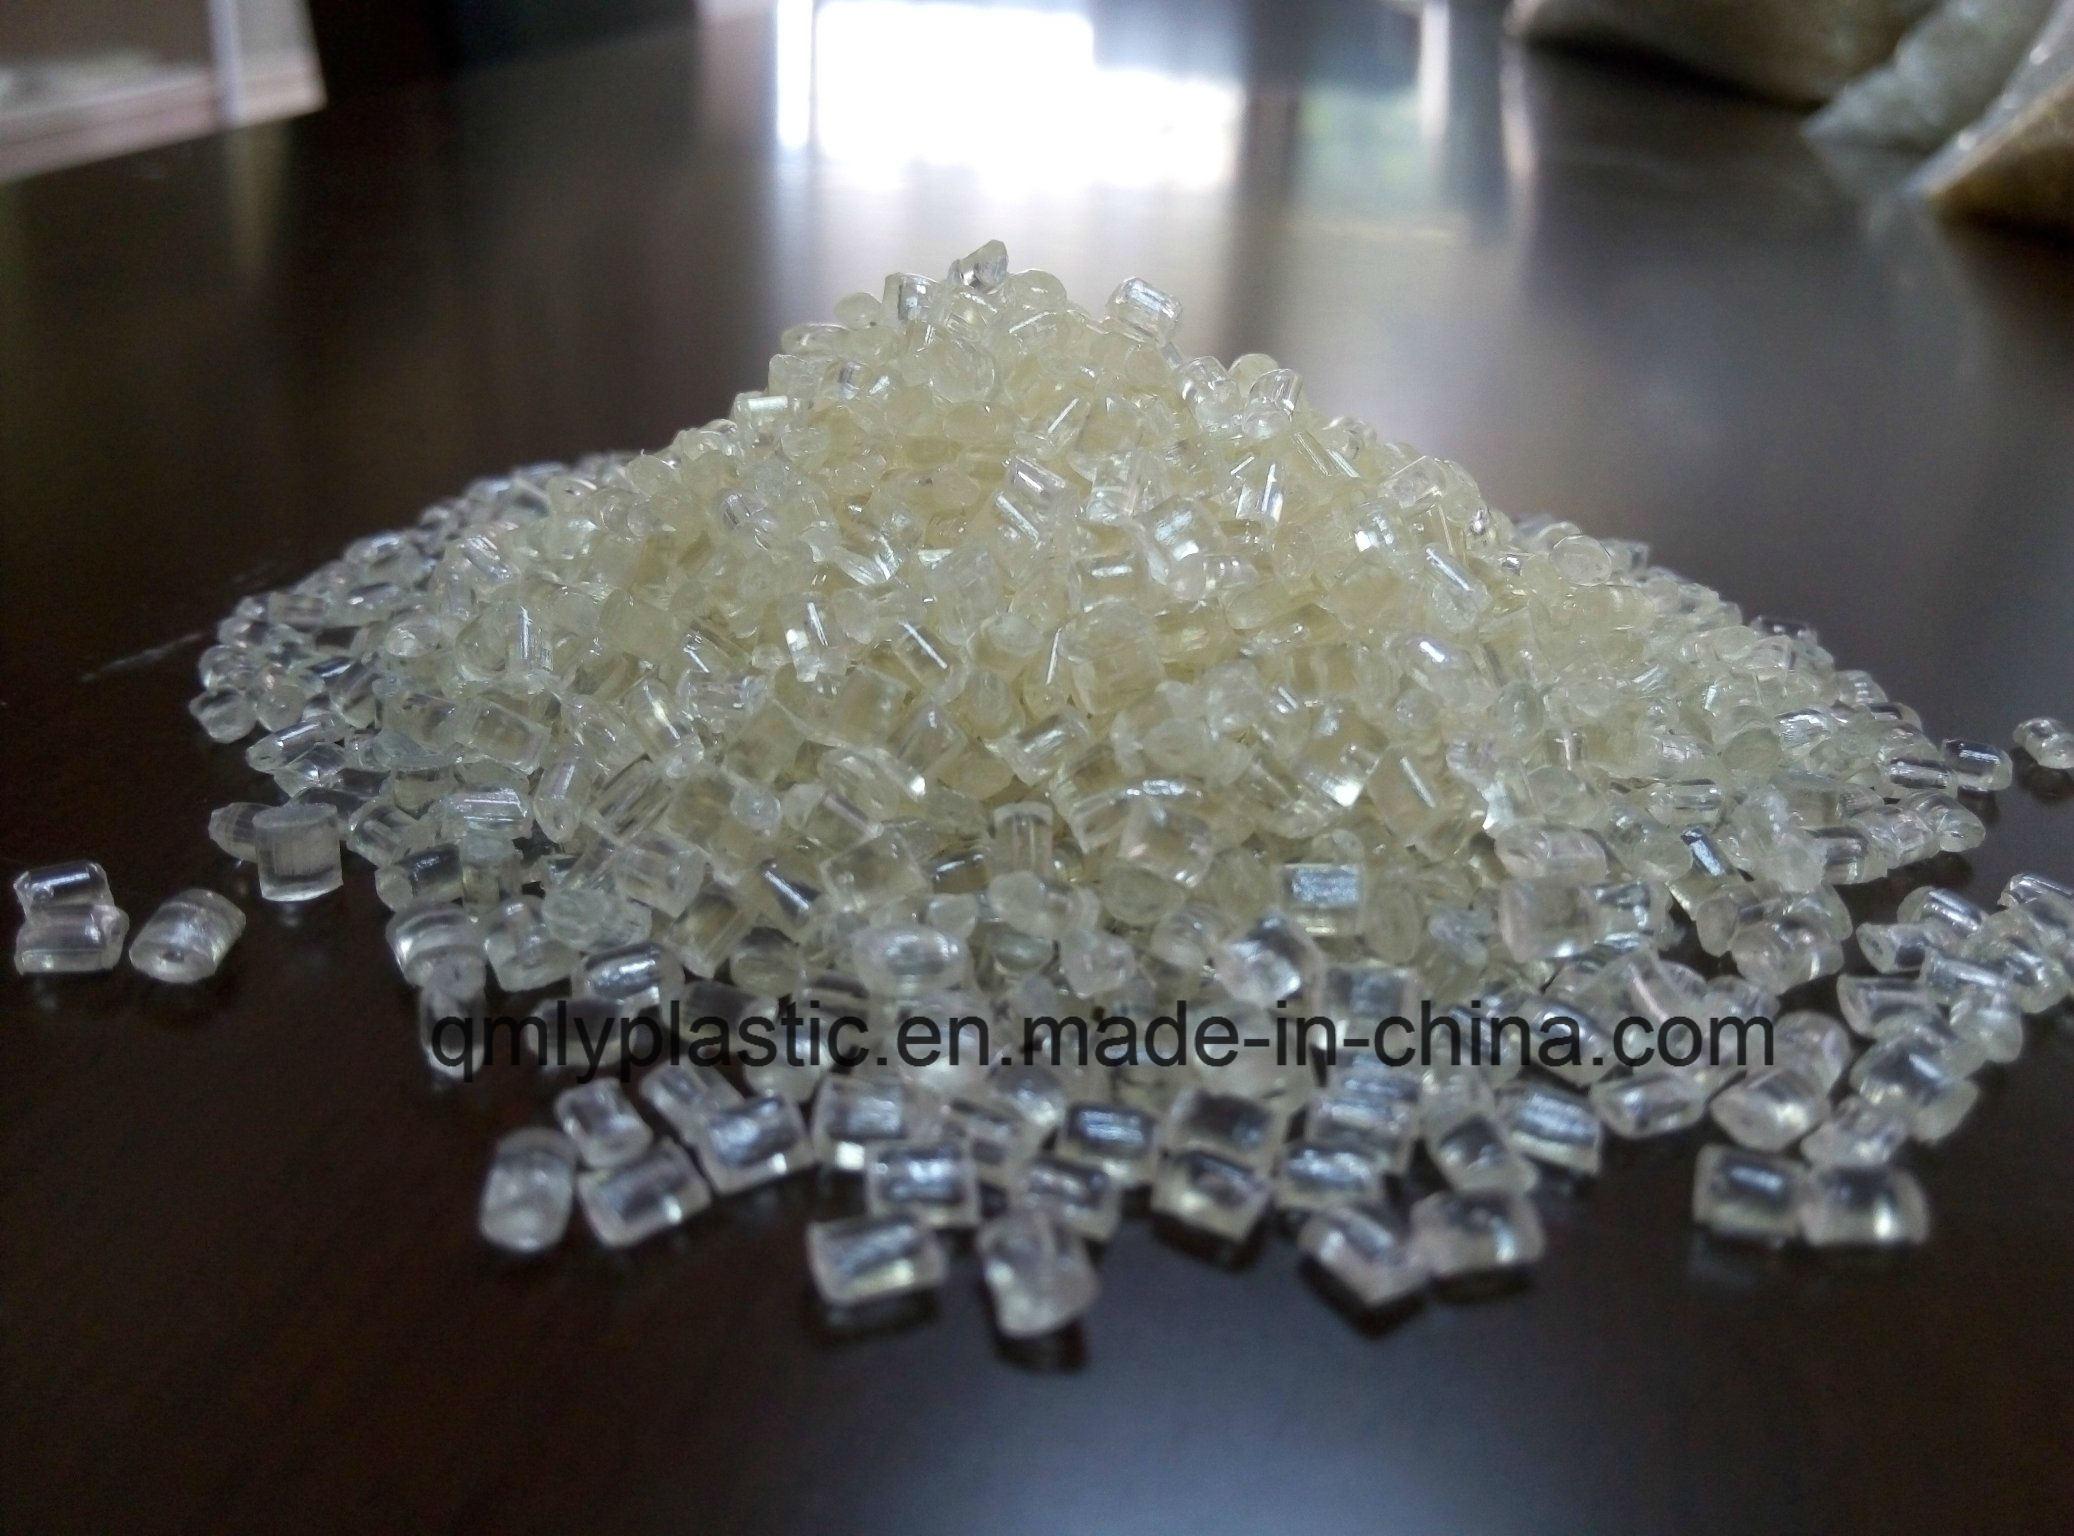 Hot Sale Slight Amber Thermoplastic PPSU for Optics